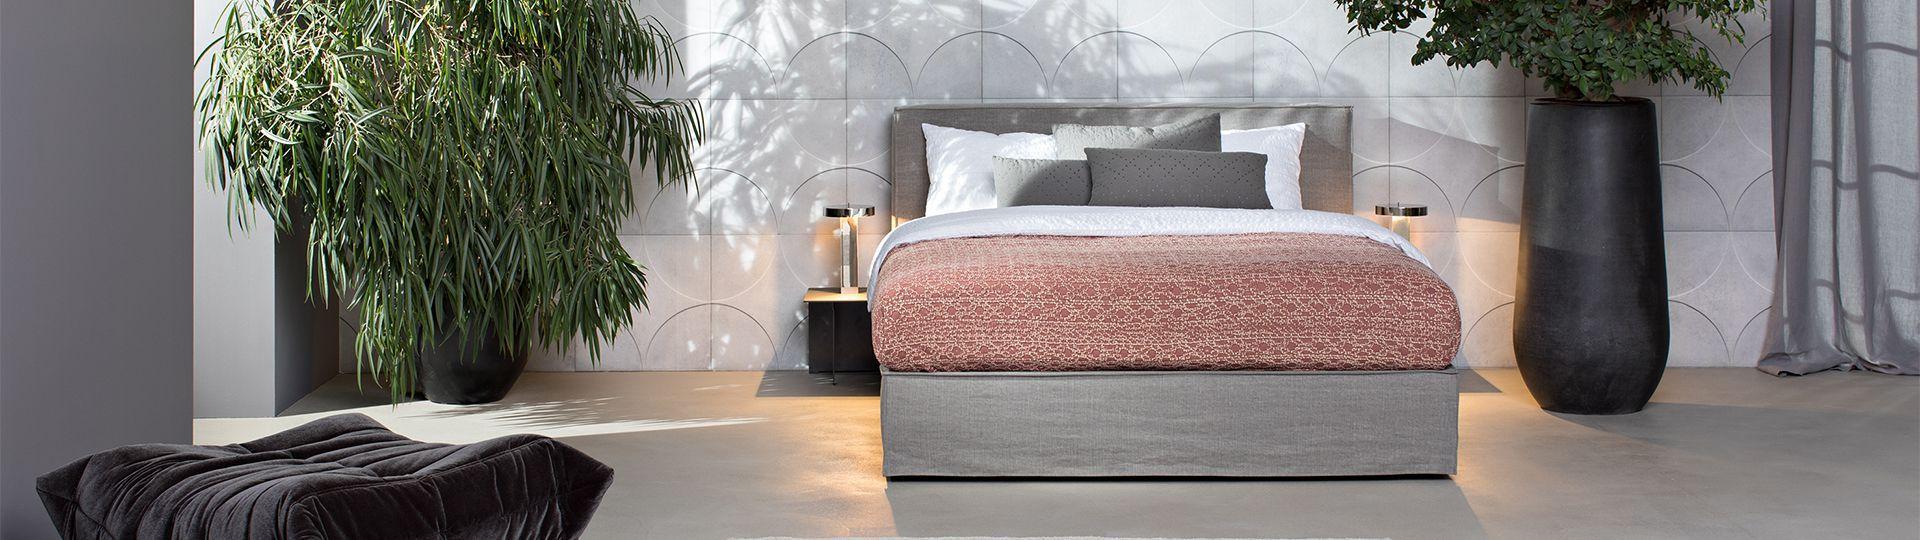 Schramm Pure Beds Cleo